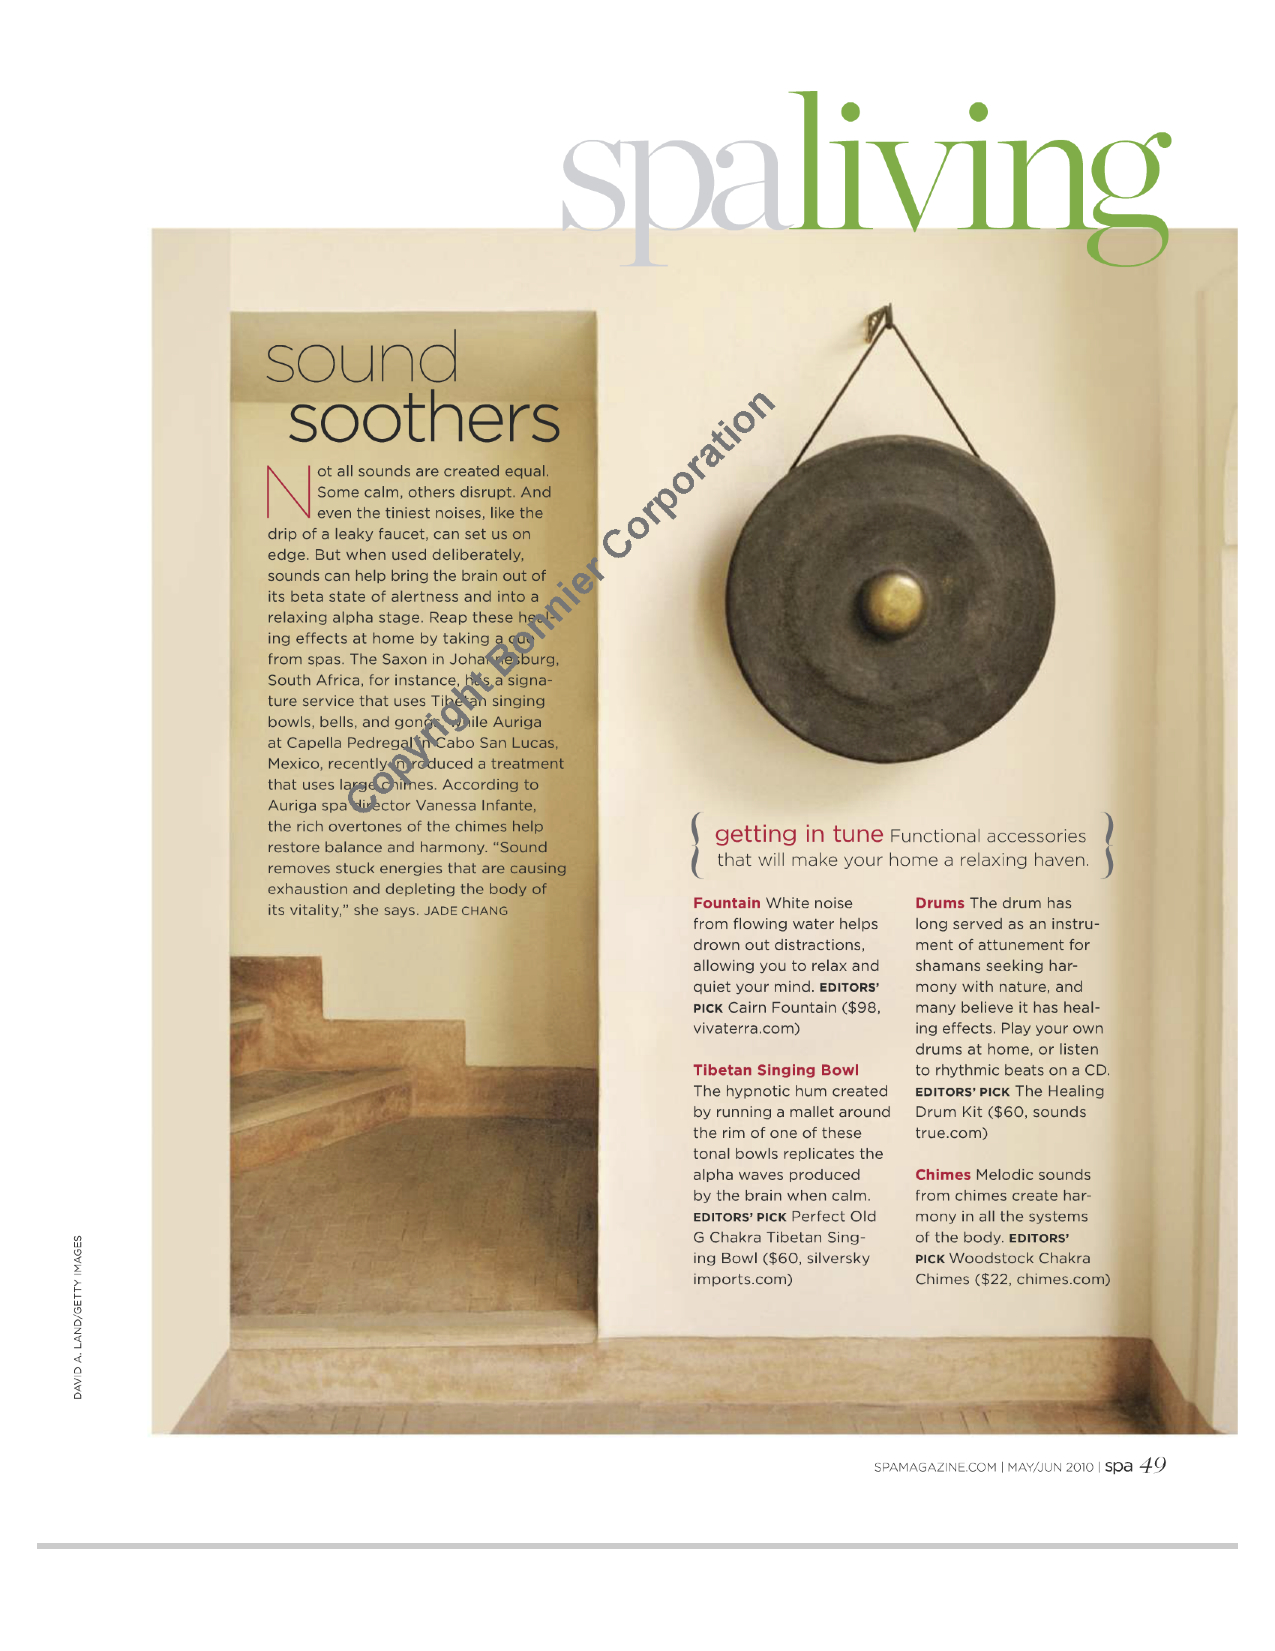 spa-magazine-silver-sky-imports.jpg